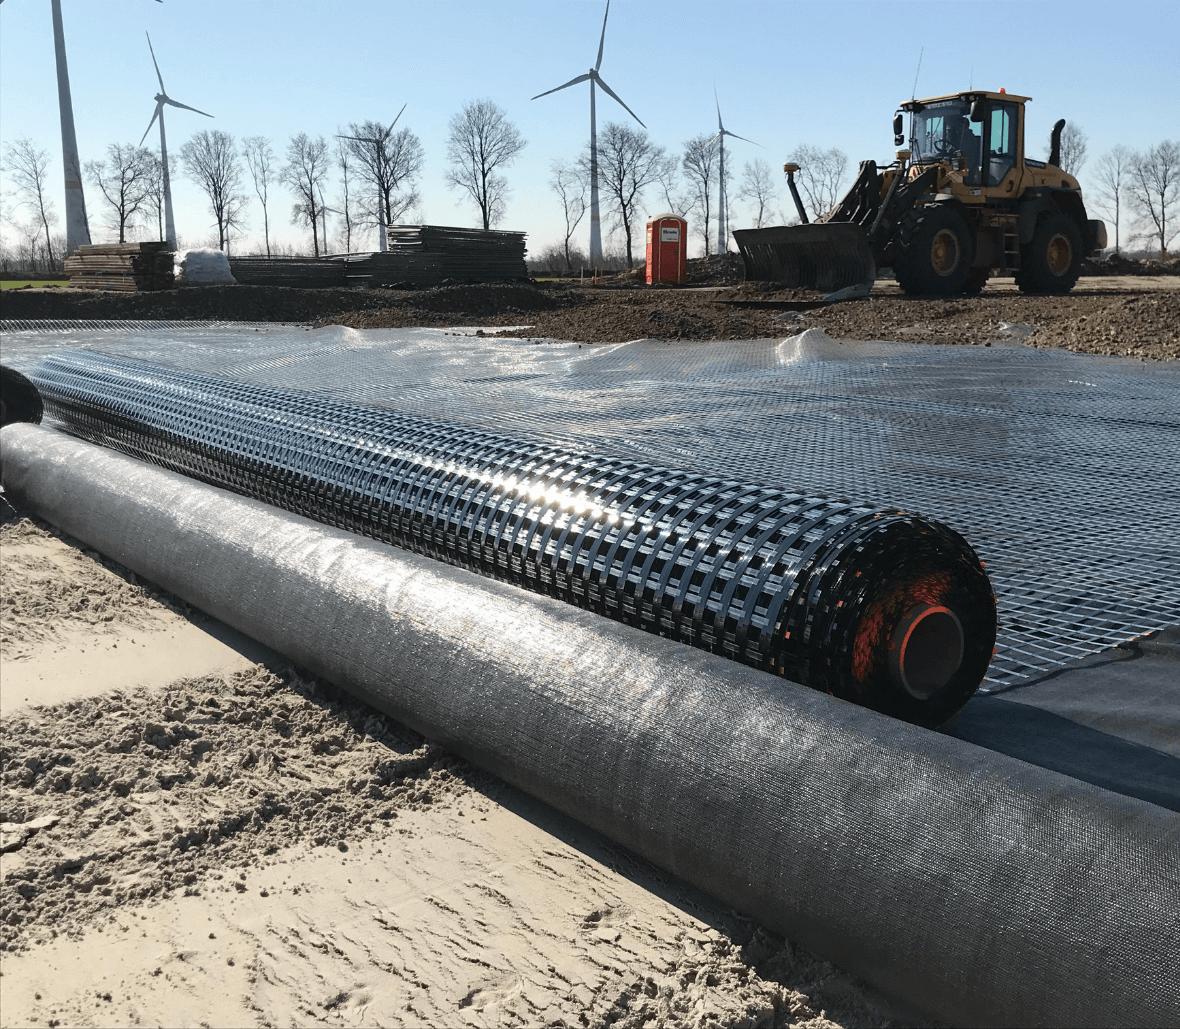 EnkaGrid_georid for soil stabilization wind mill park_copyrights Low & Bonar_Enka Solutions